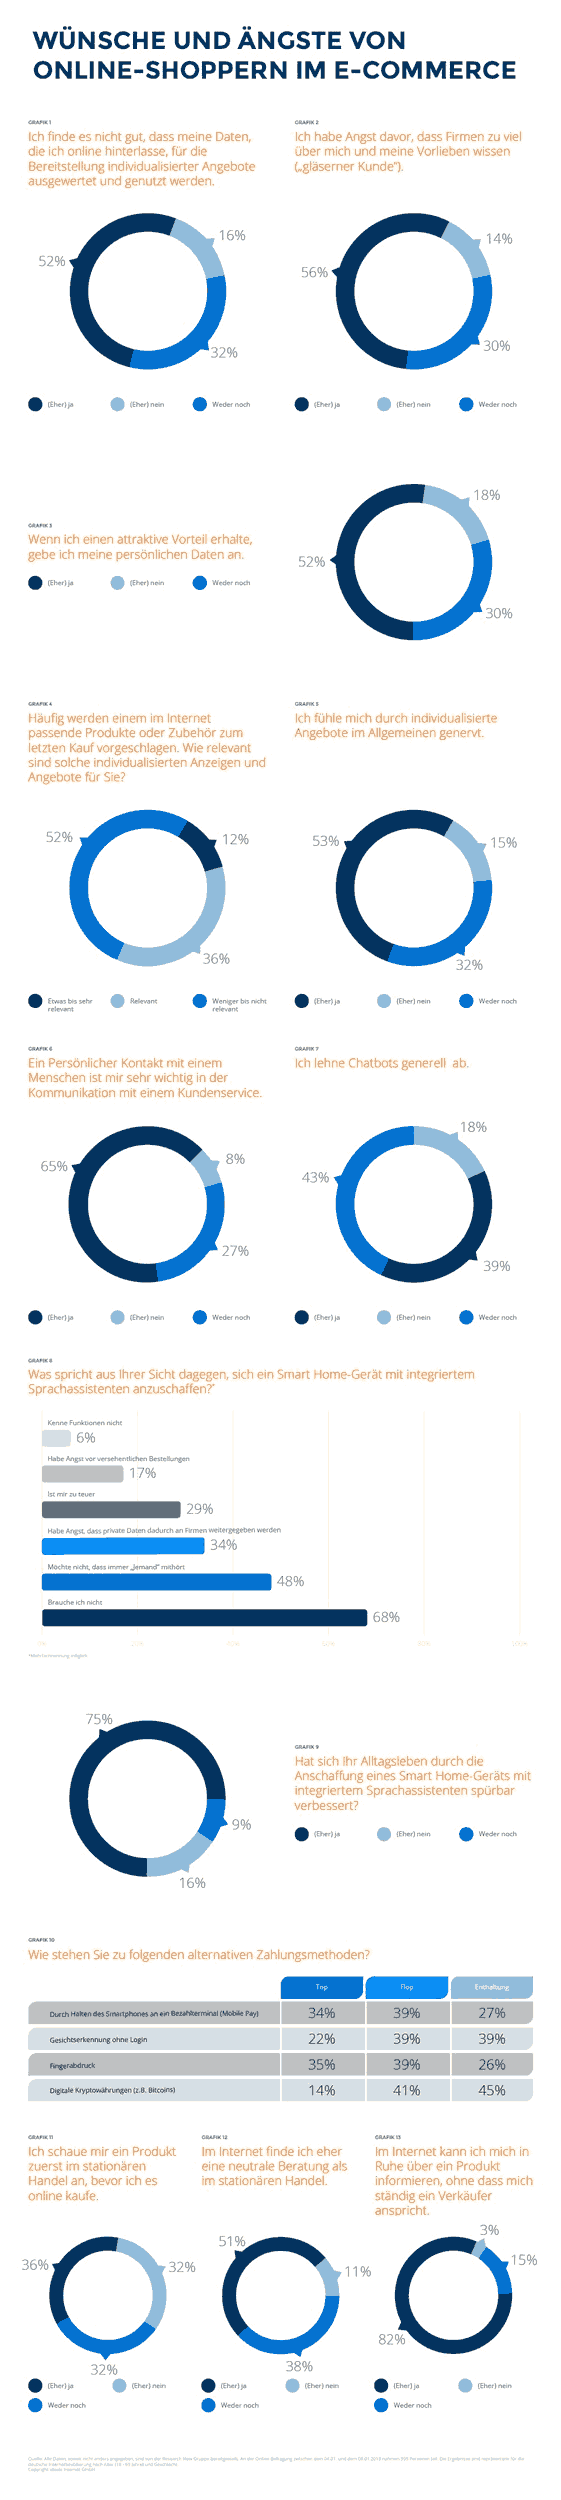 Infografik zur Idealo-Studie